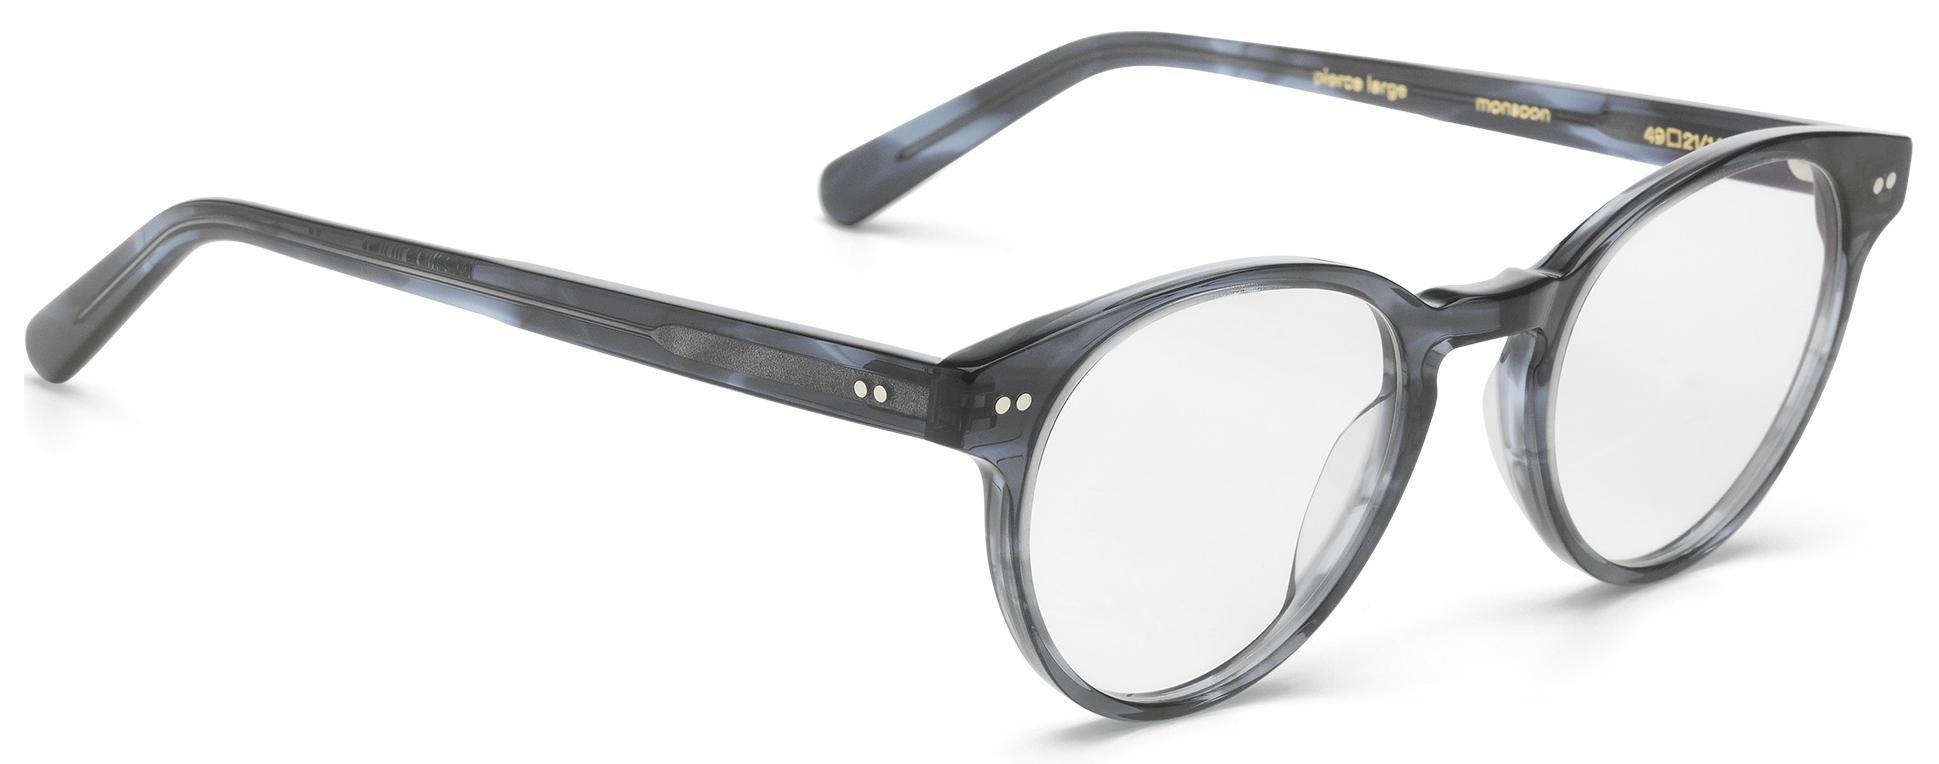 Pierce Large Glasses